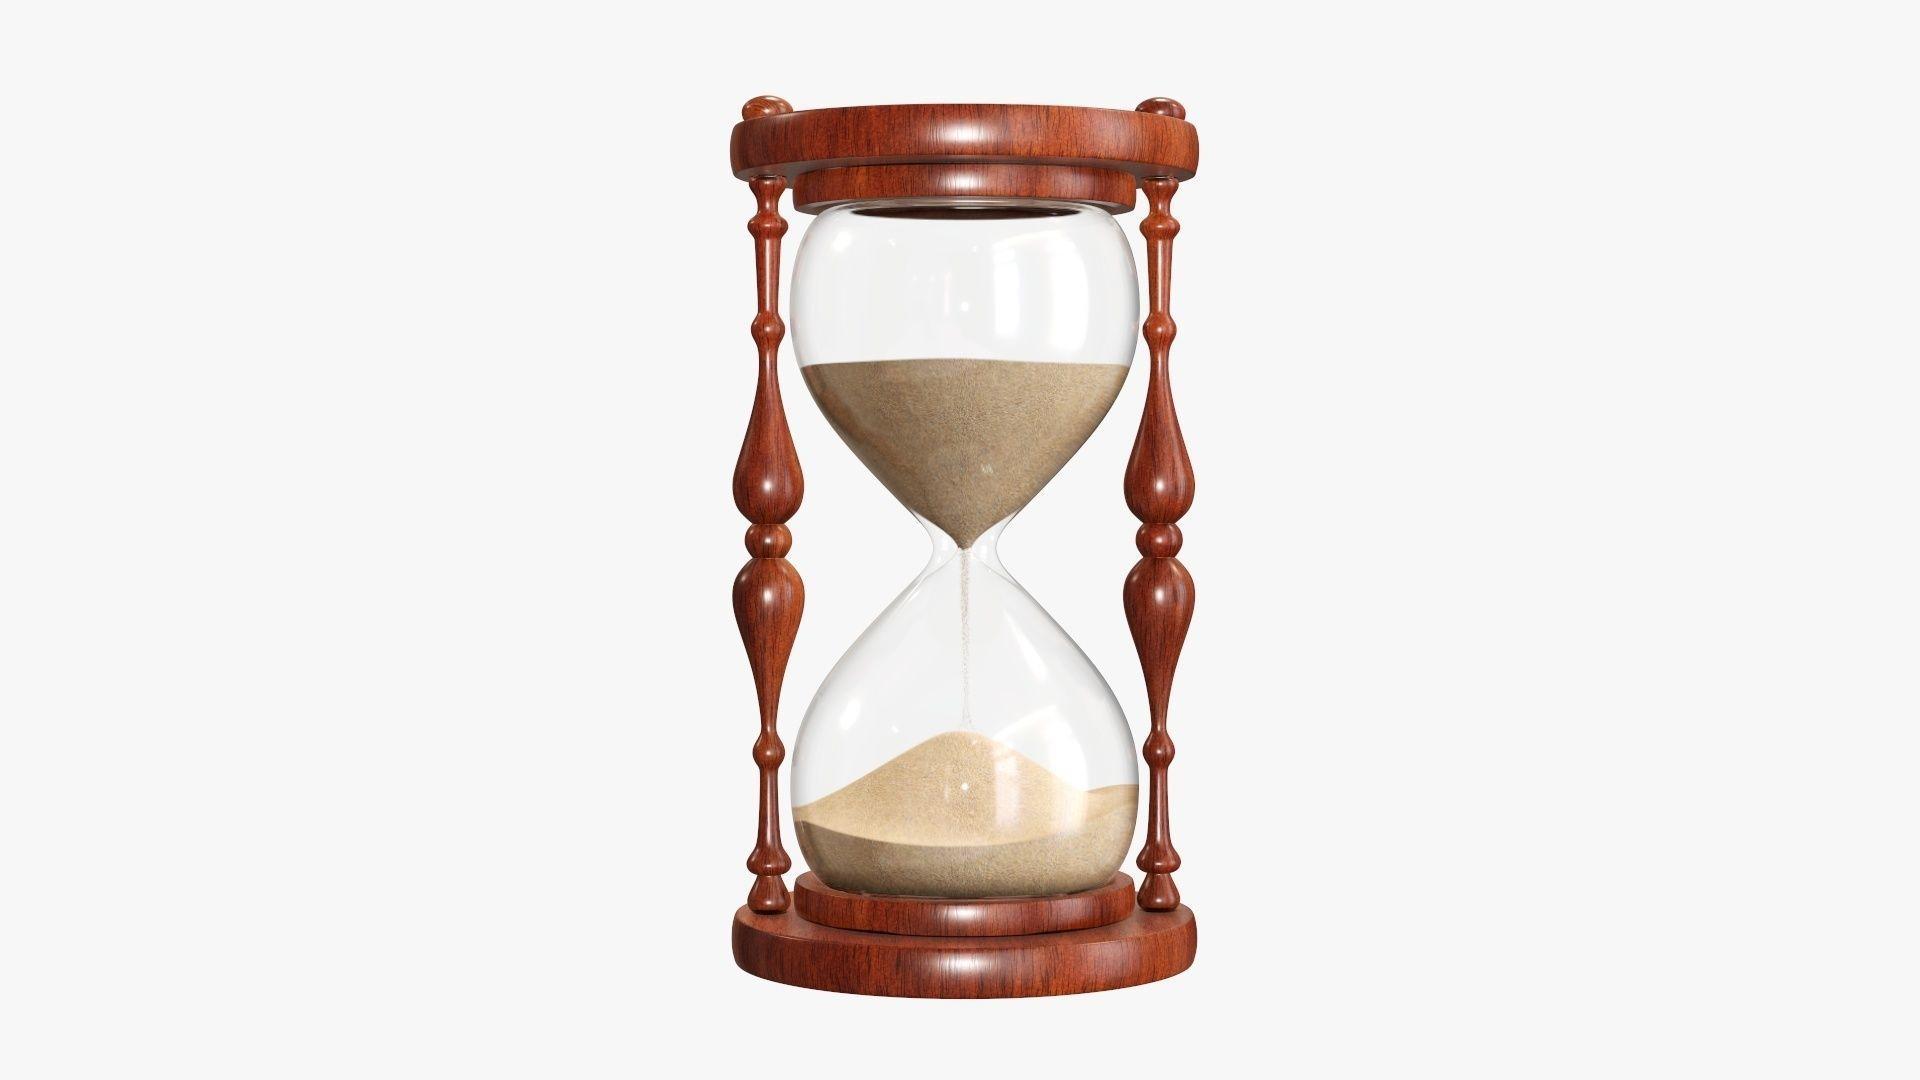 Hourglass sandglass egg sand timer clock 03